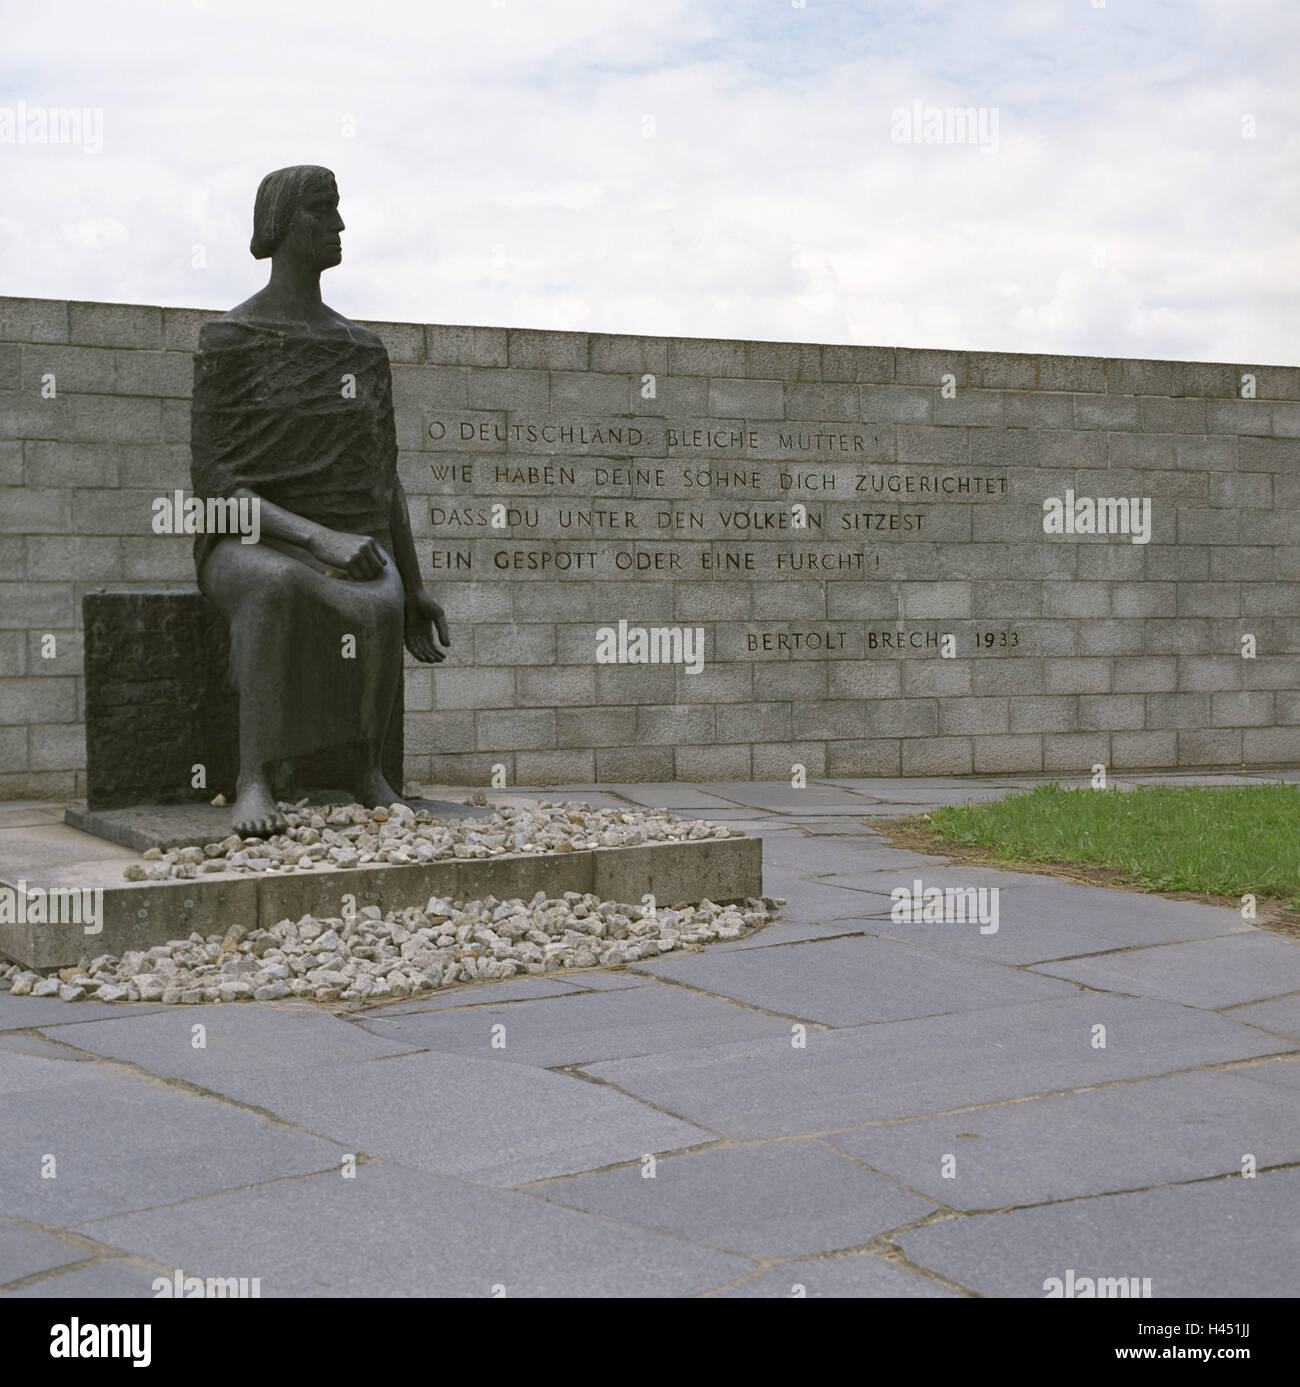 Austria, Mauthausen, concentration camp memorial, sculpture, GDR monument, sculpture, woman, Upper Austria, memorial, - Stock Image